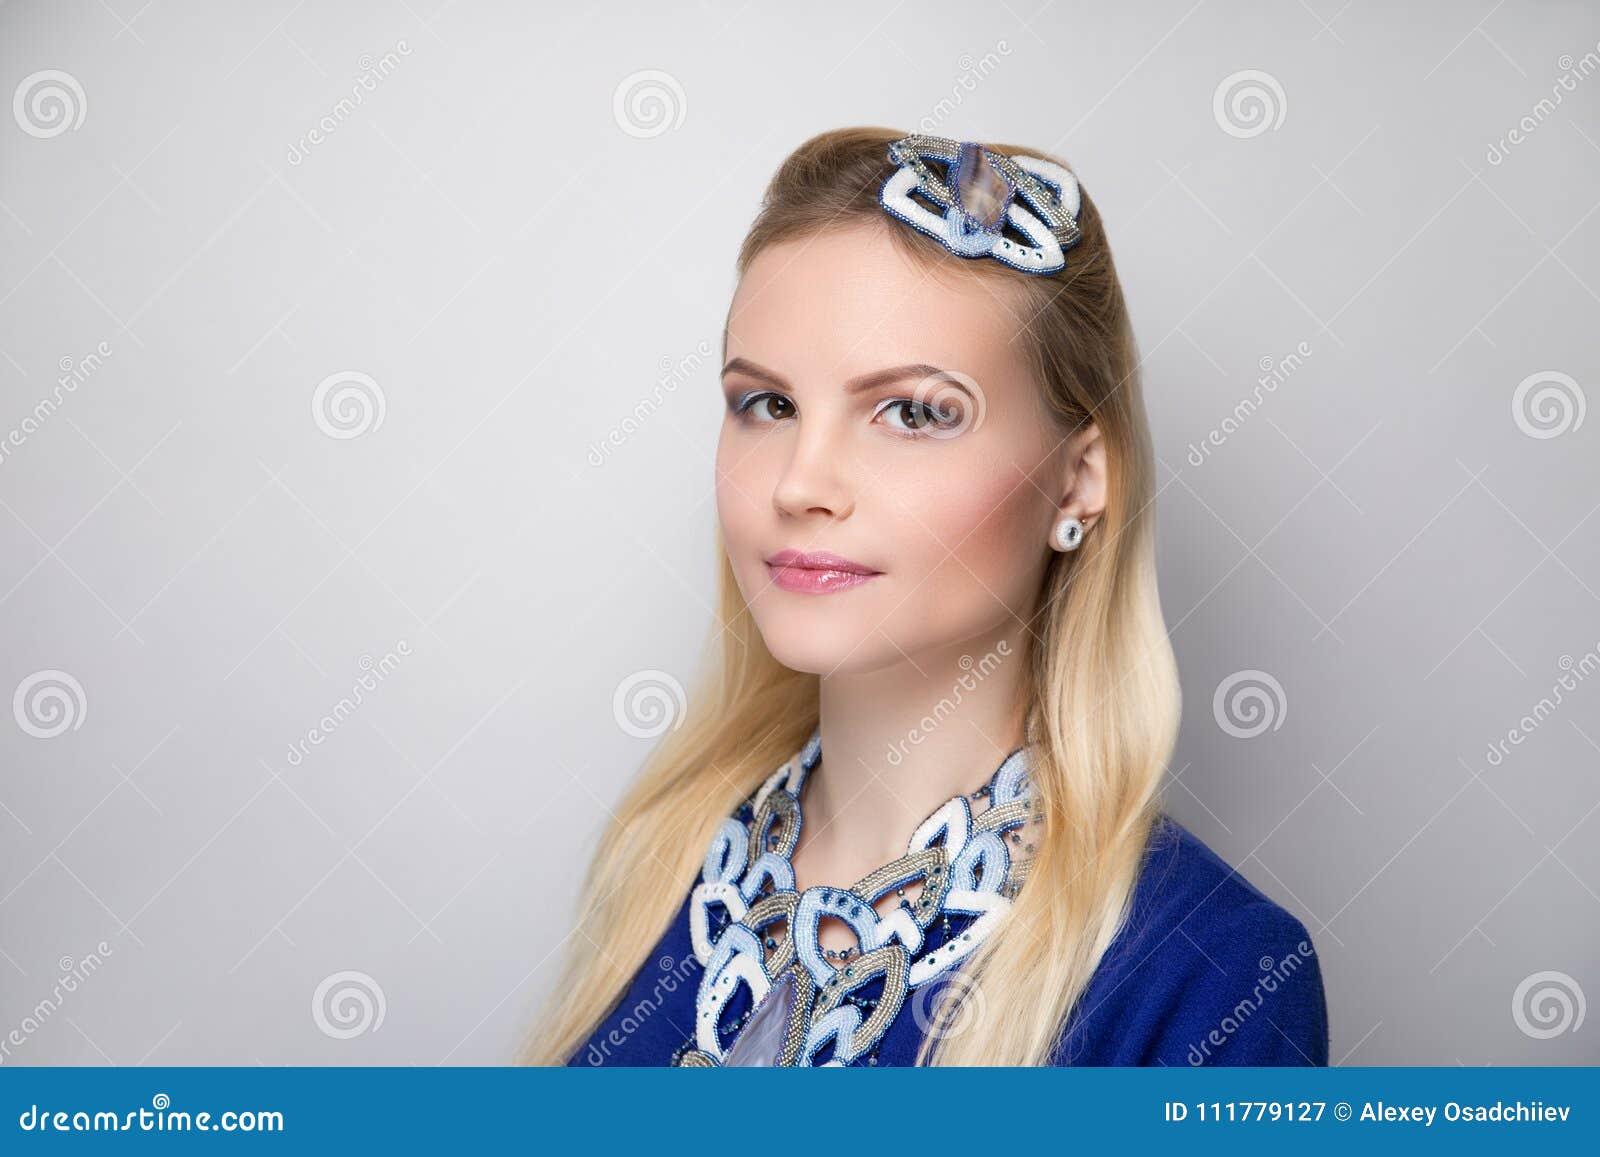 Woman blue white make up